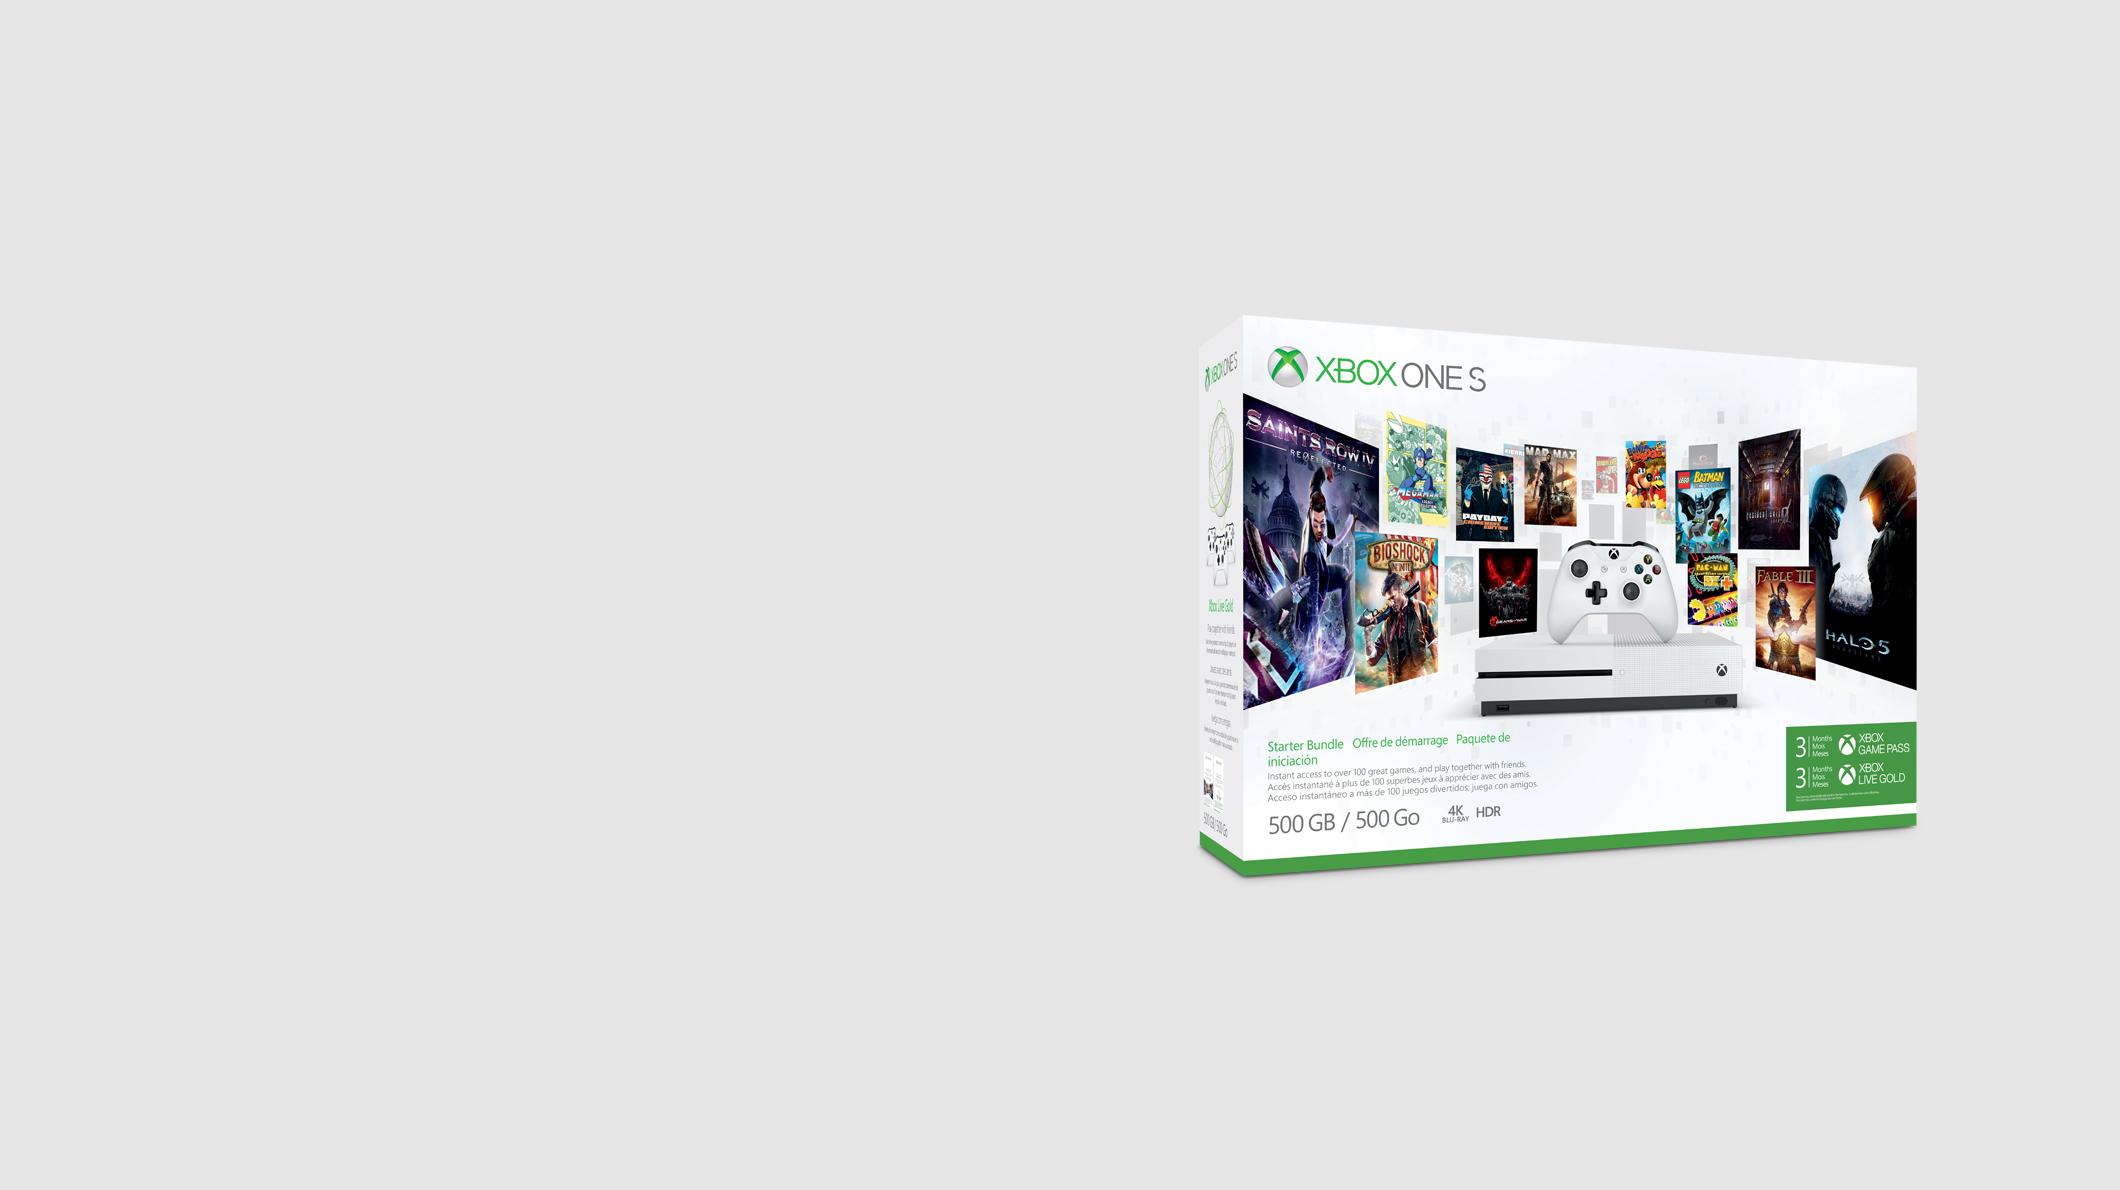 An Xbox One S Starter Bundle